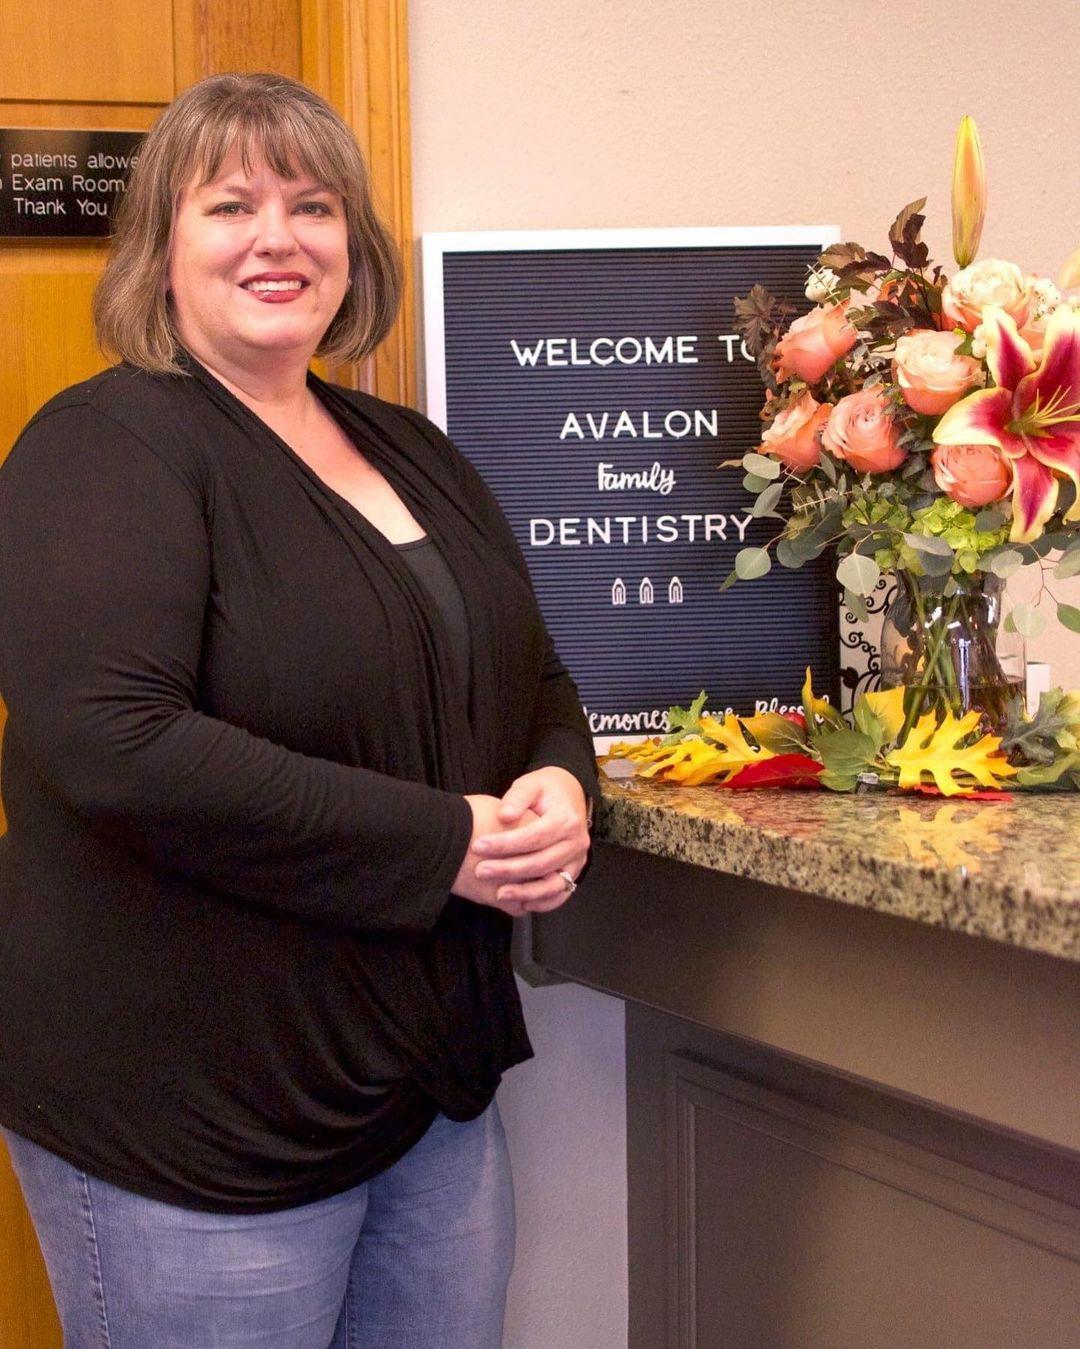 cristi avalon family dentistry